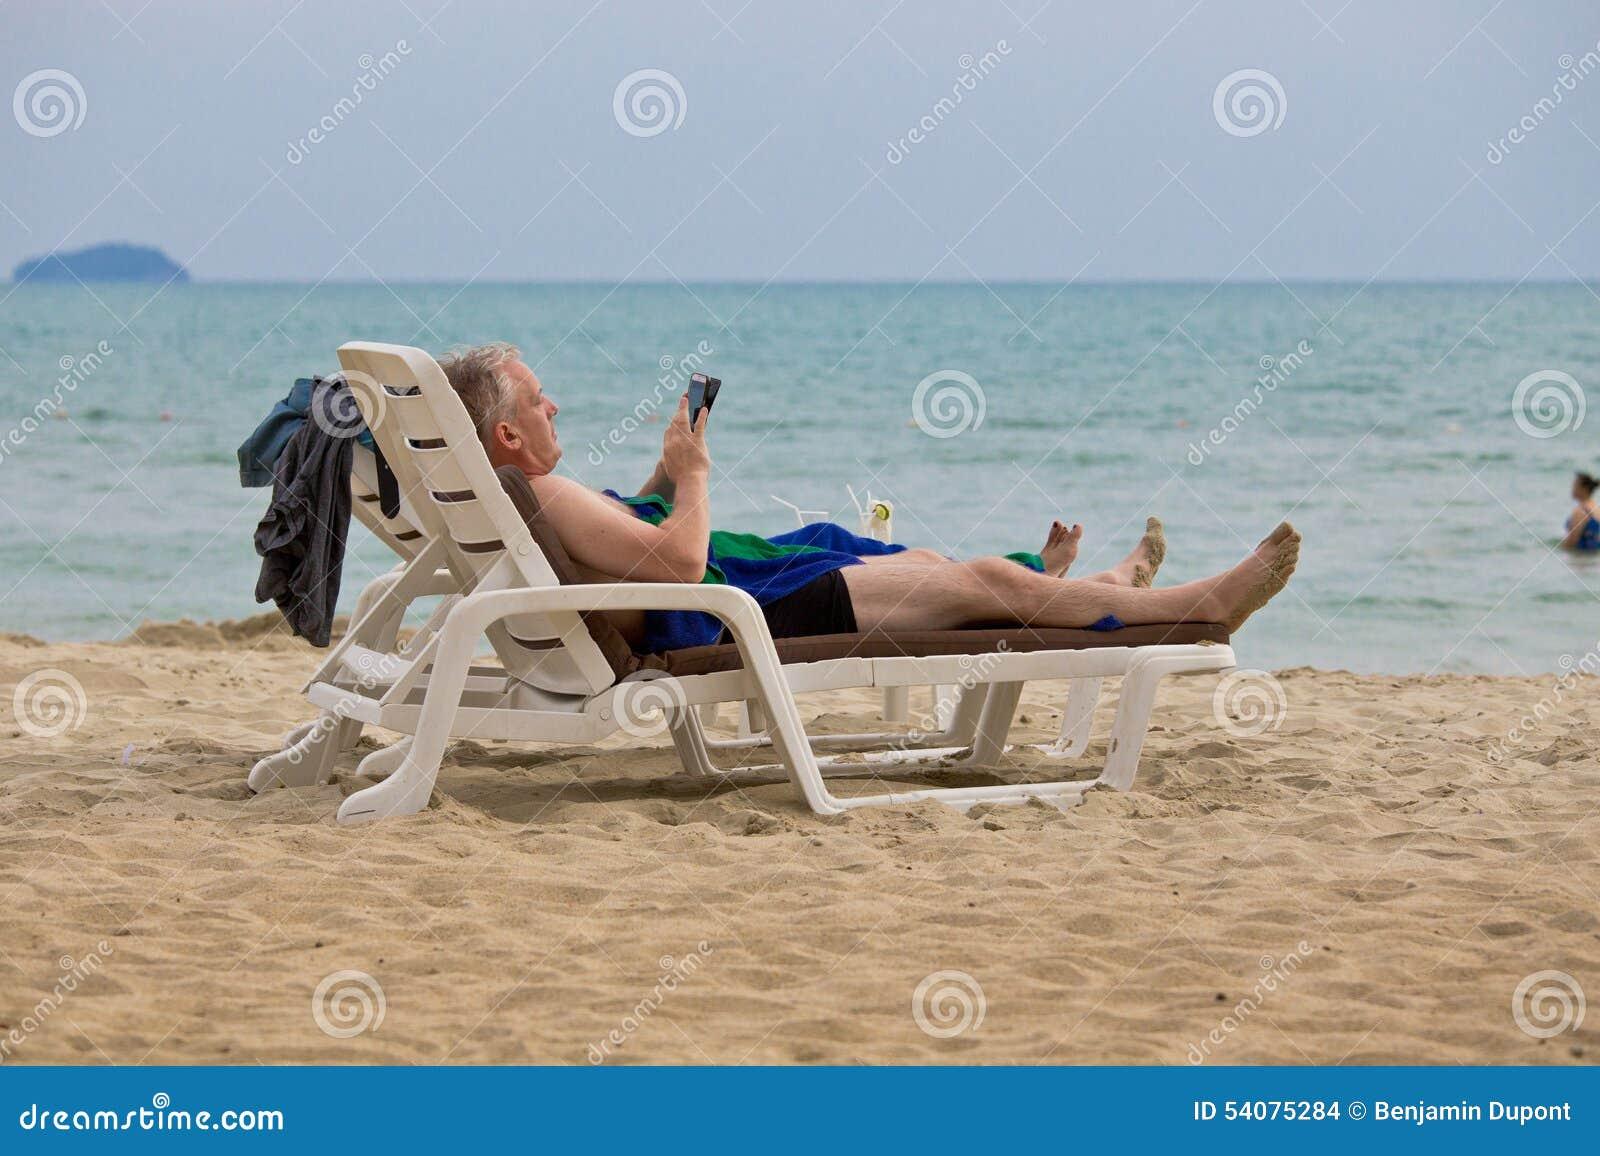 Toerist het ontspannen op a sunbed beack